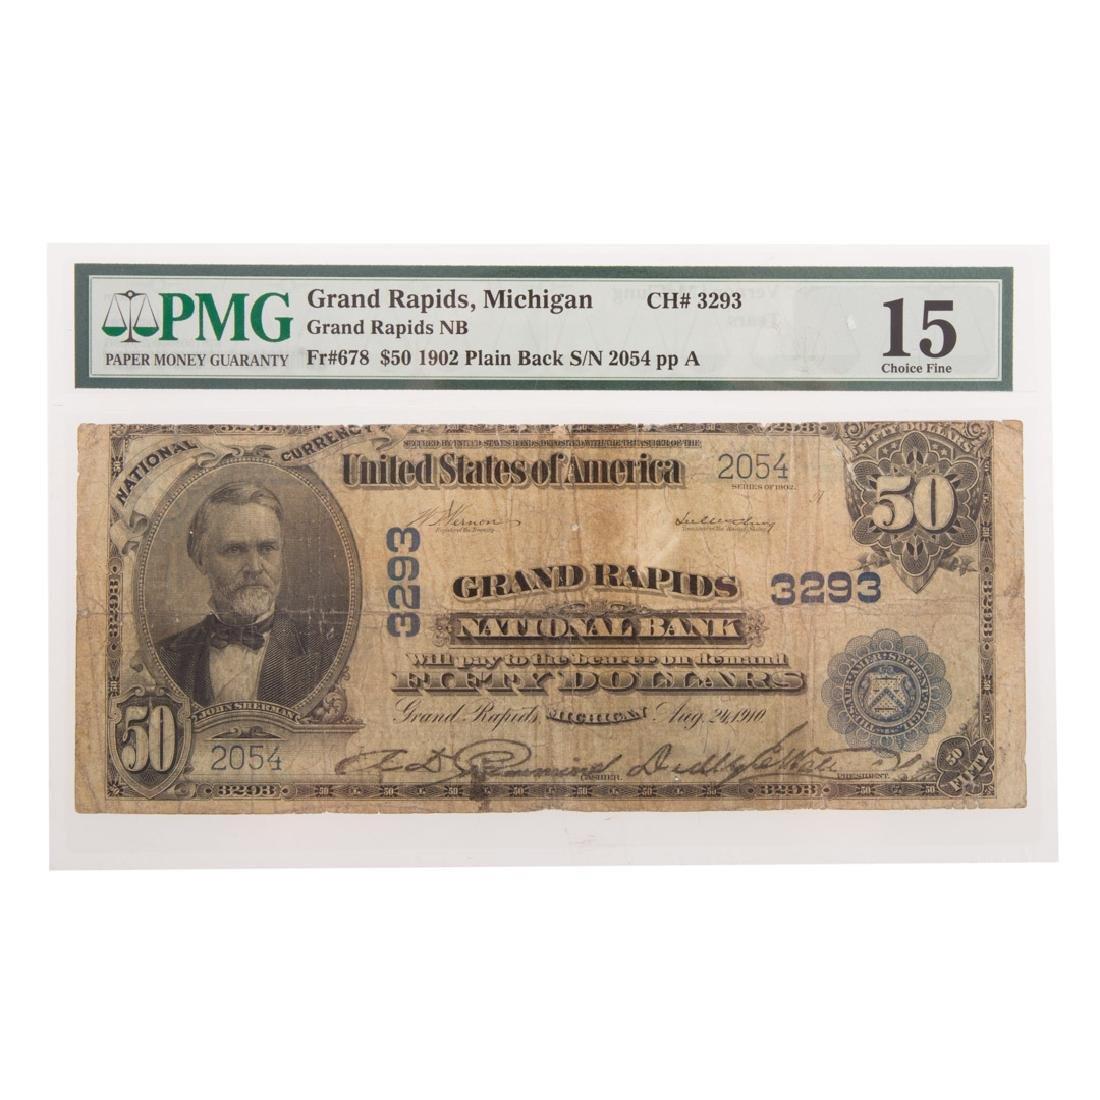 [US] $50 1902 Plain Back Ch# 3293 PMG Fine-15